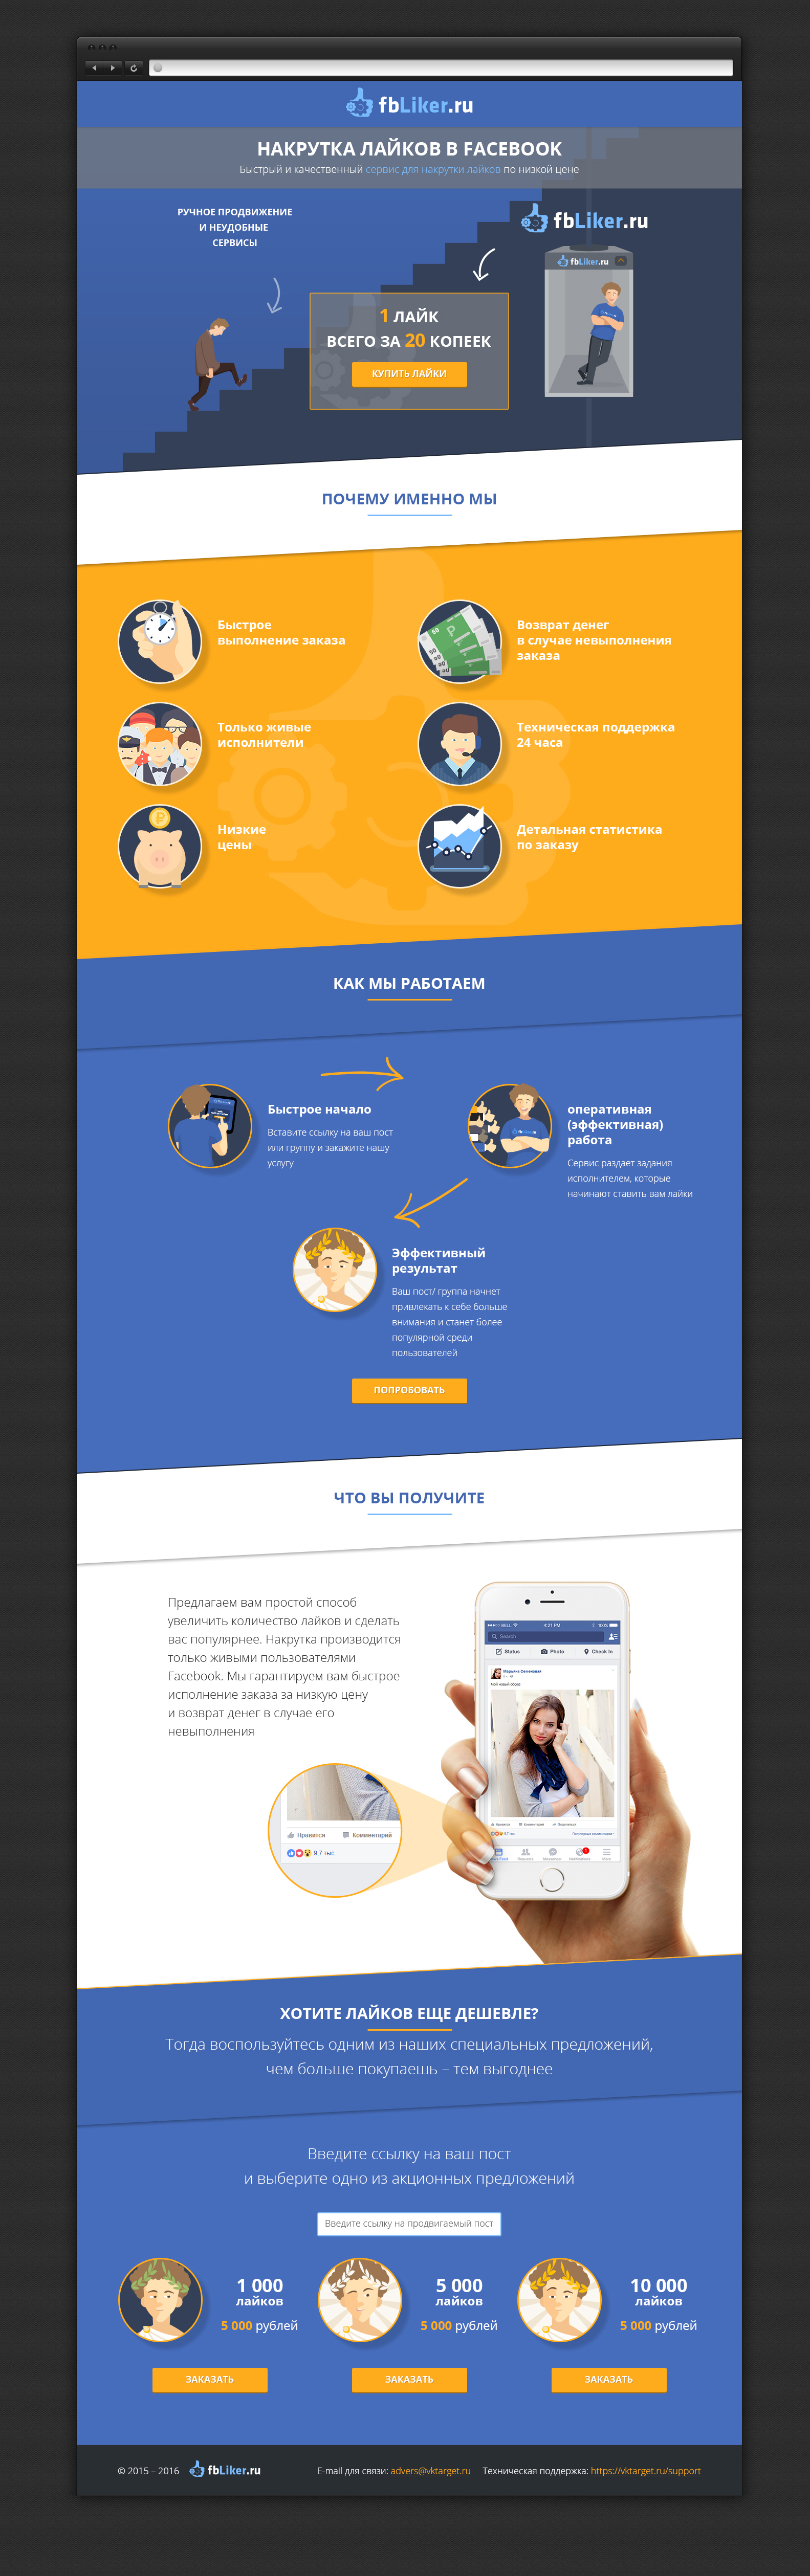 Дизайн лендинга для SMM сервиса FbLiker.ru